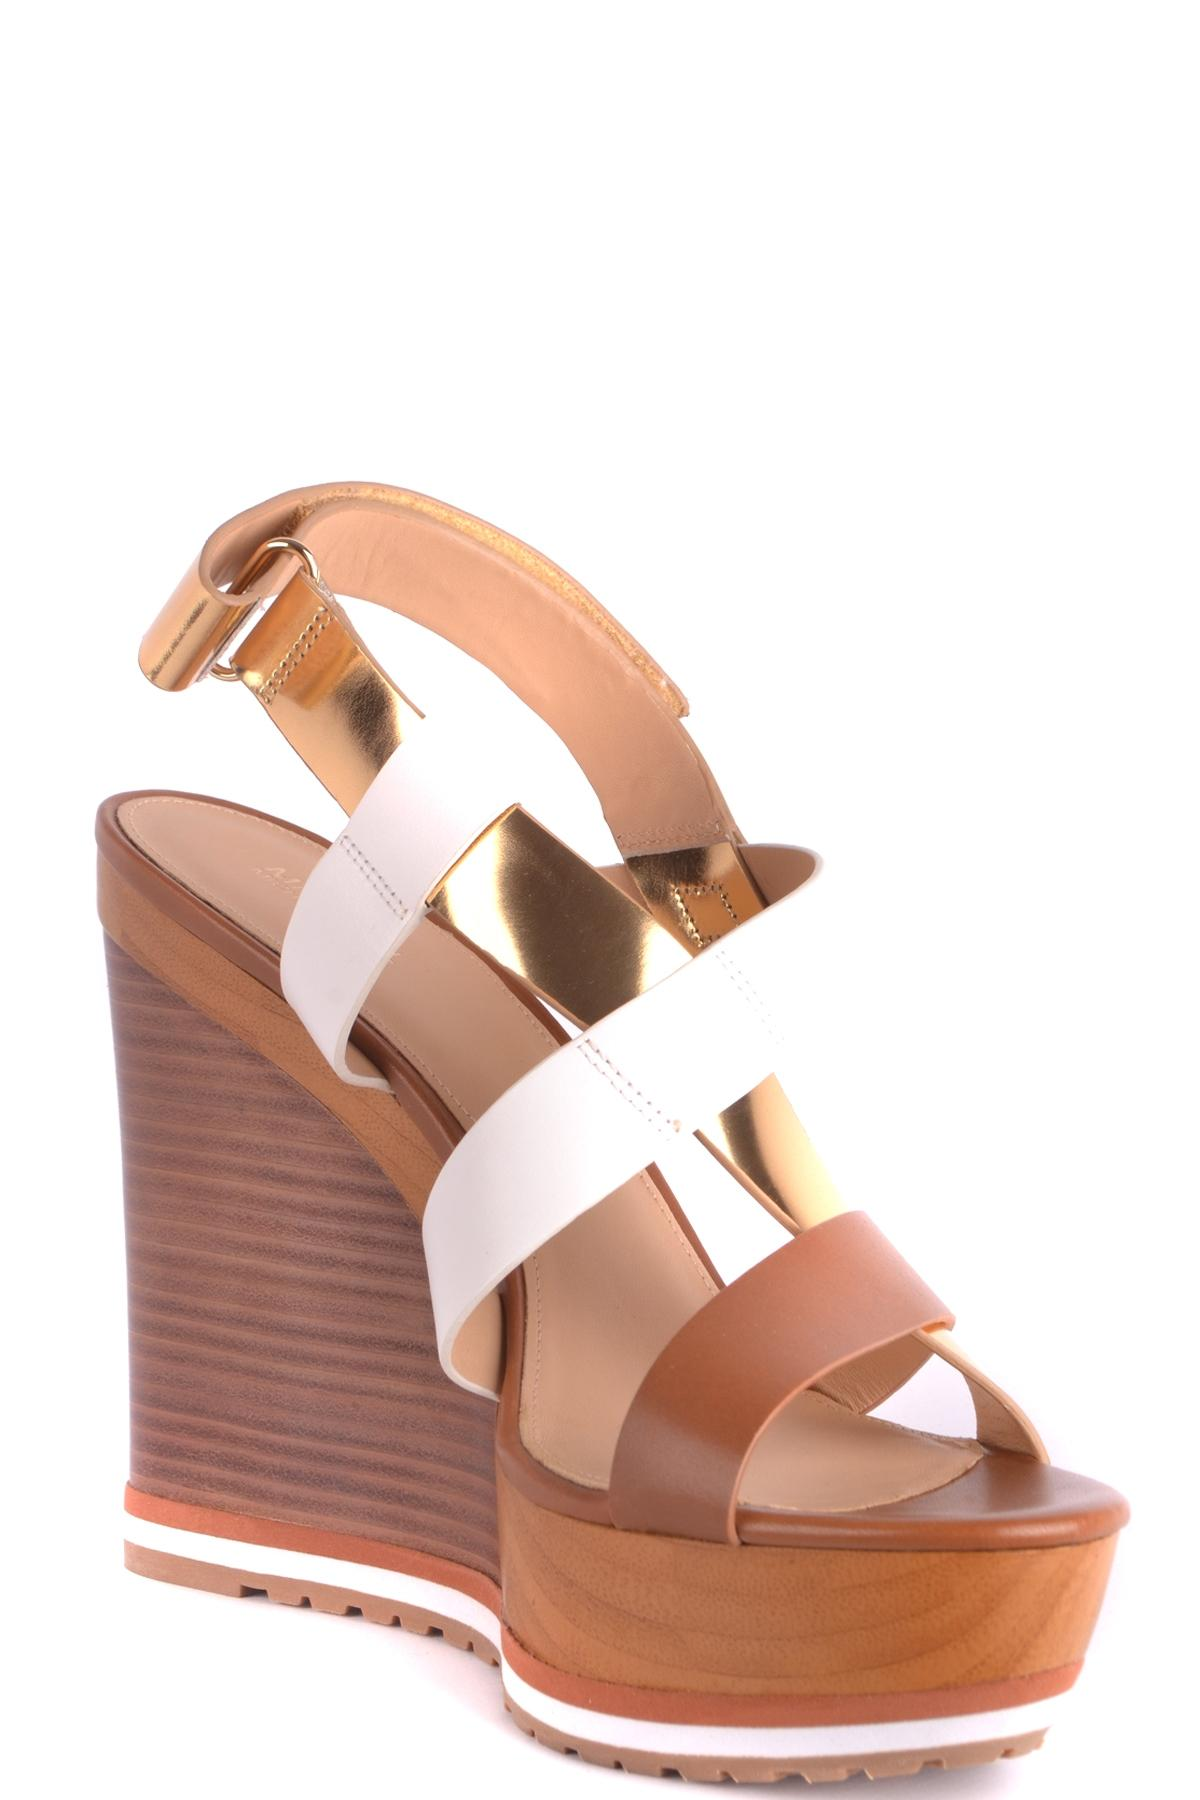 Lyst - Michael Michael Kors Darby Platform Sandals in Brown